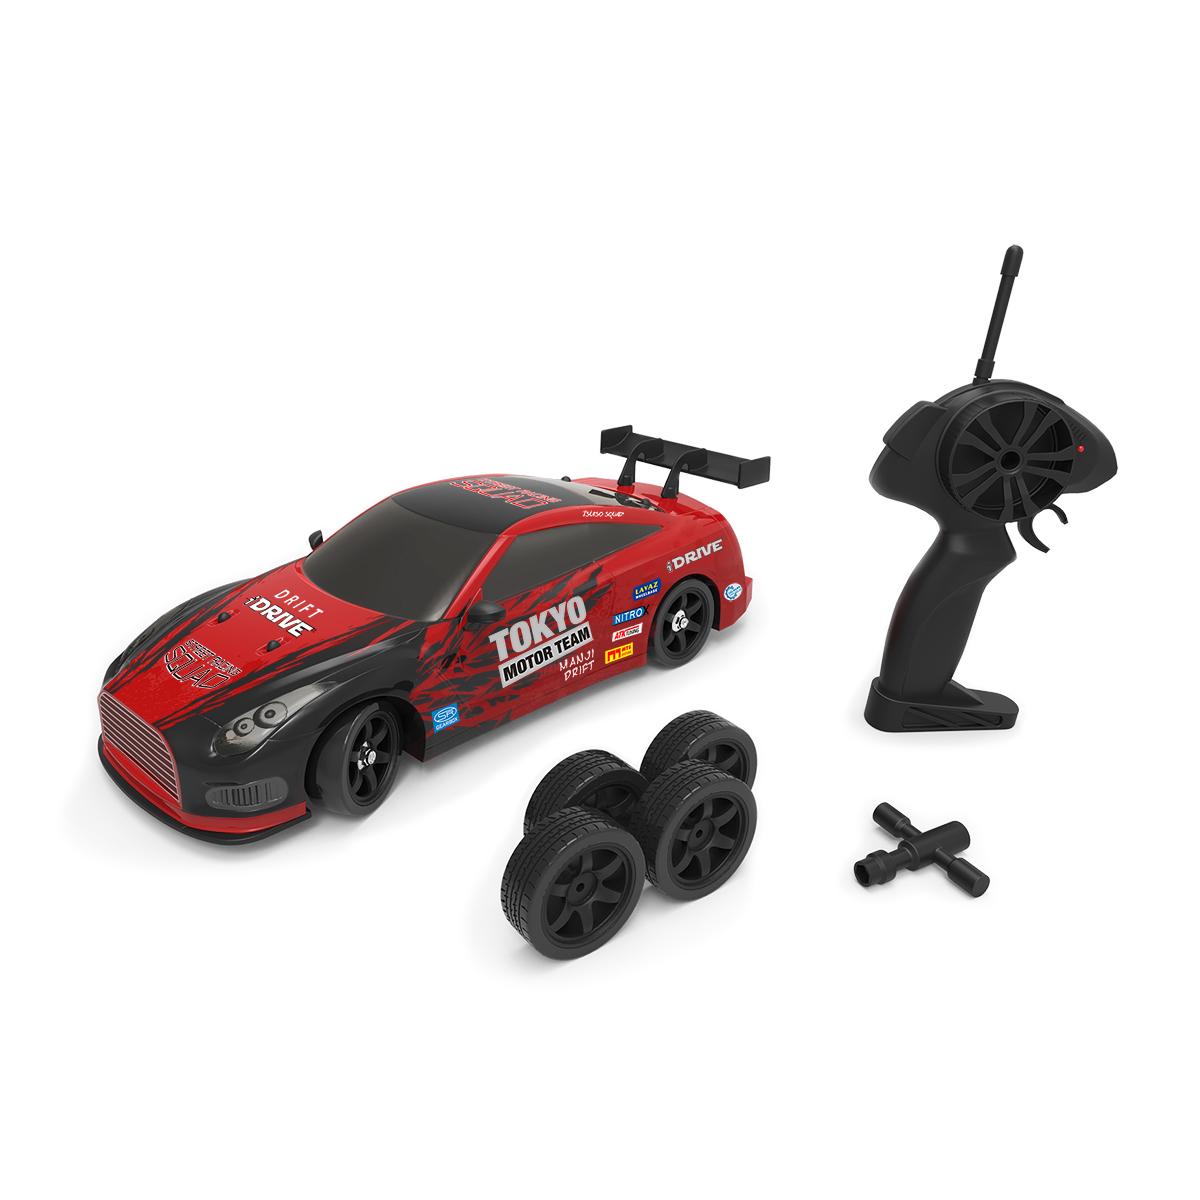 Masina cu telecomanda iDrive Drift